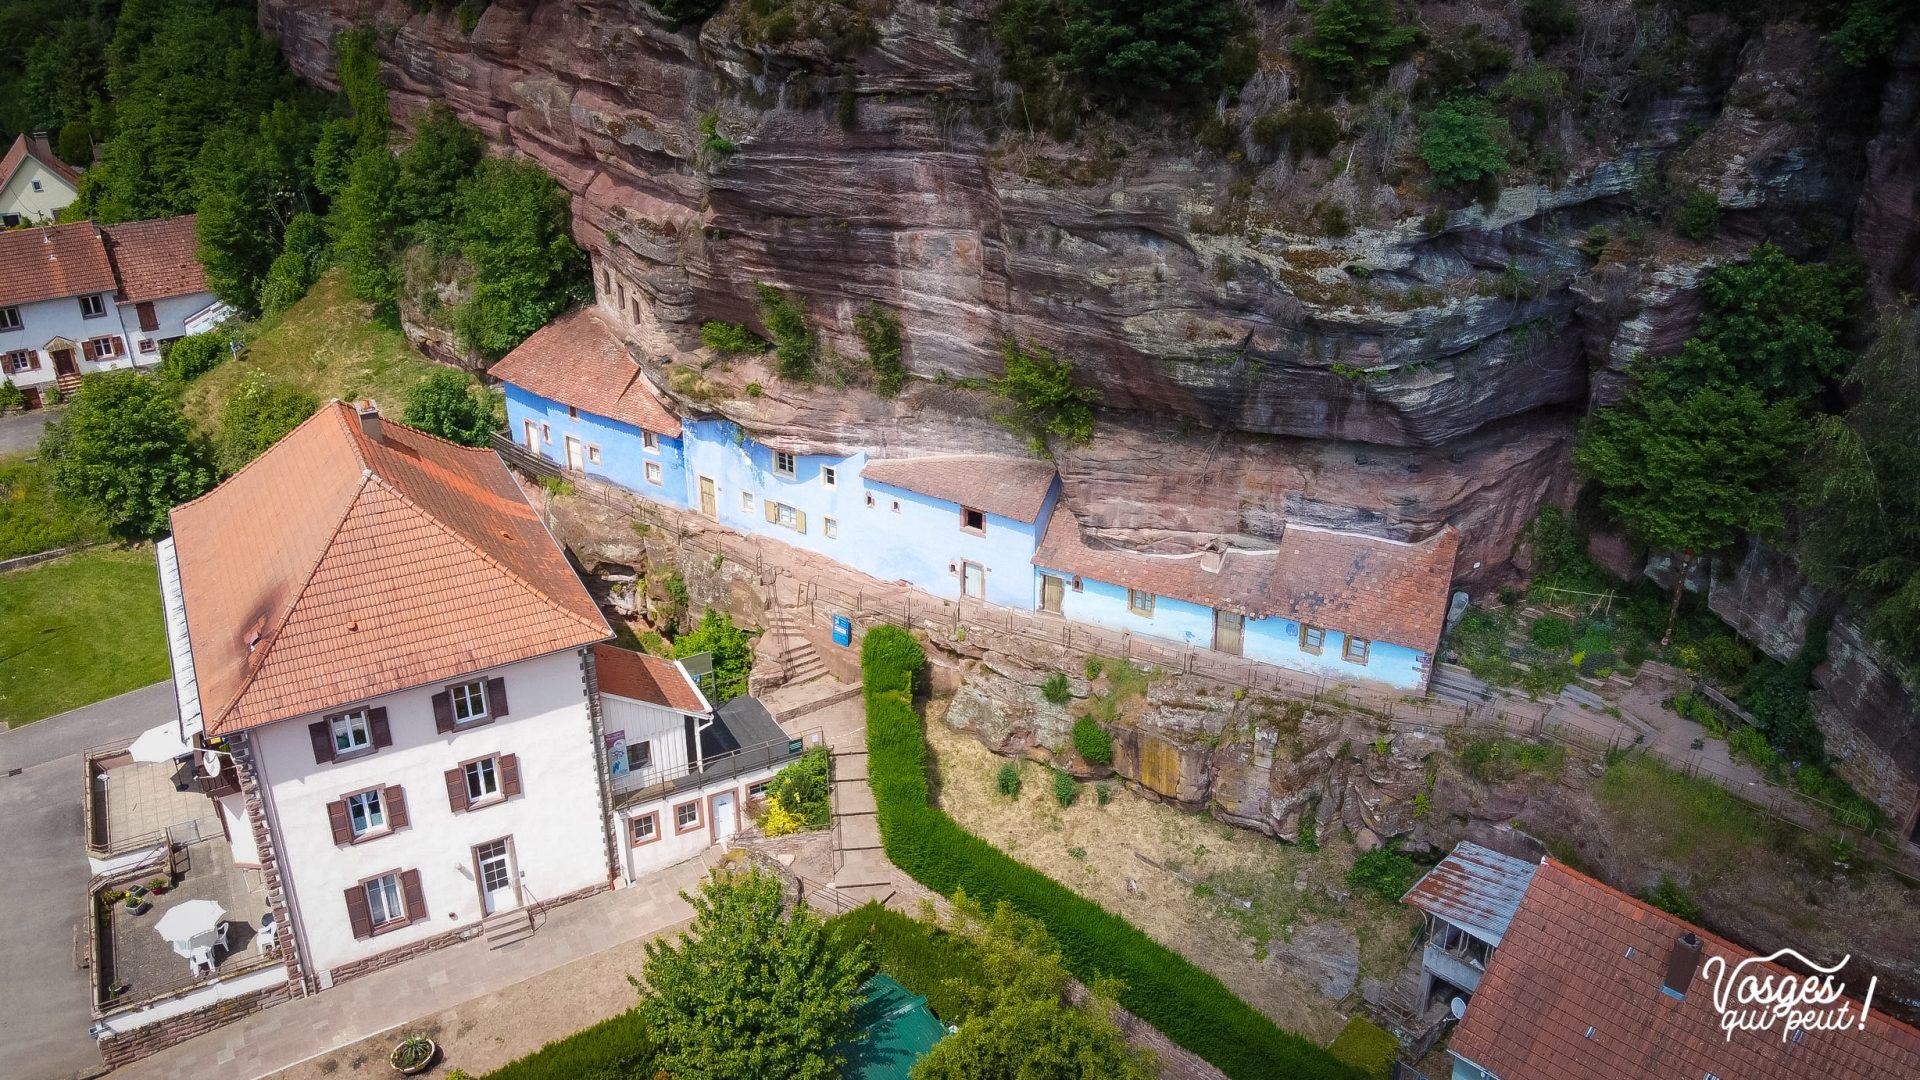 Maison troglodyte de Graufthal en Alsace